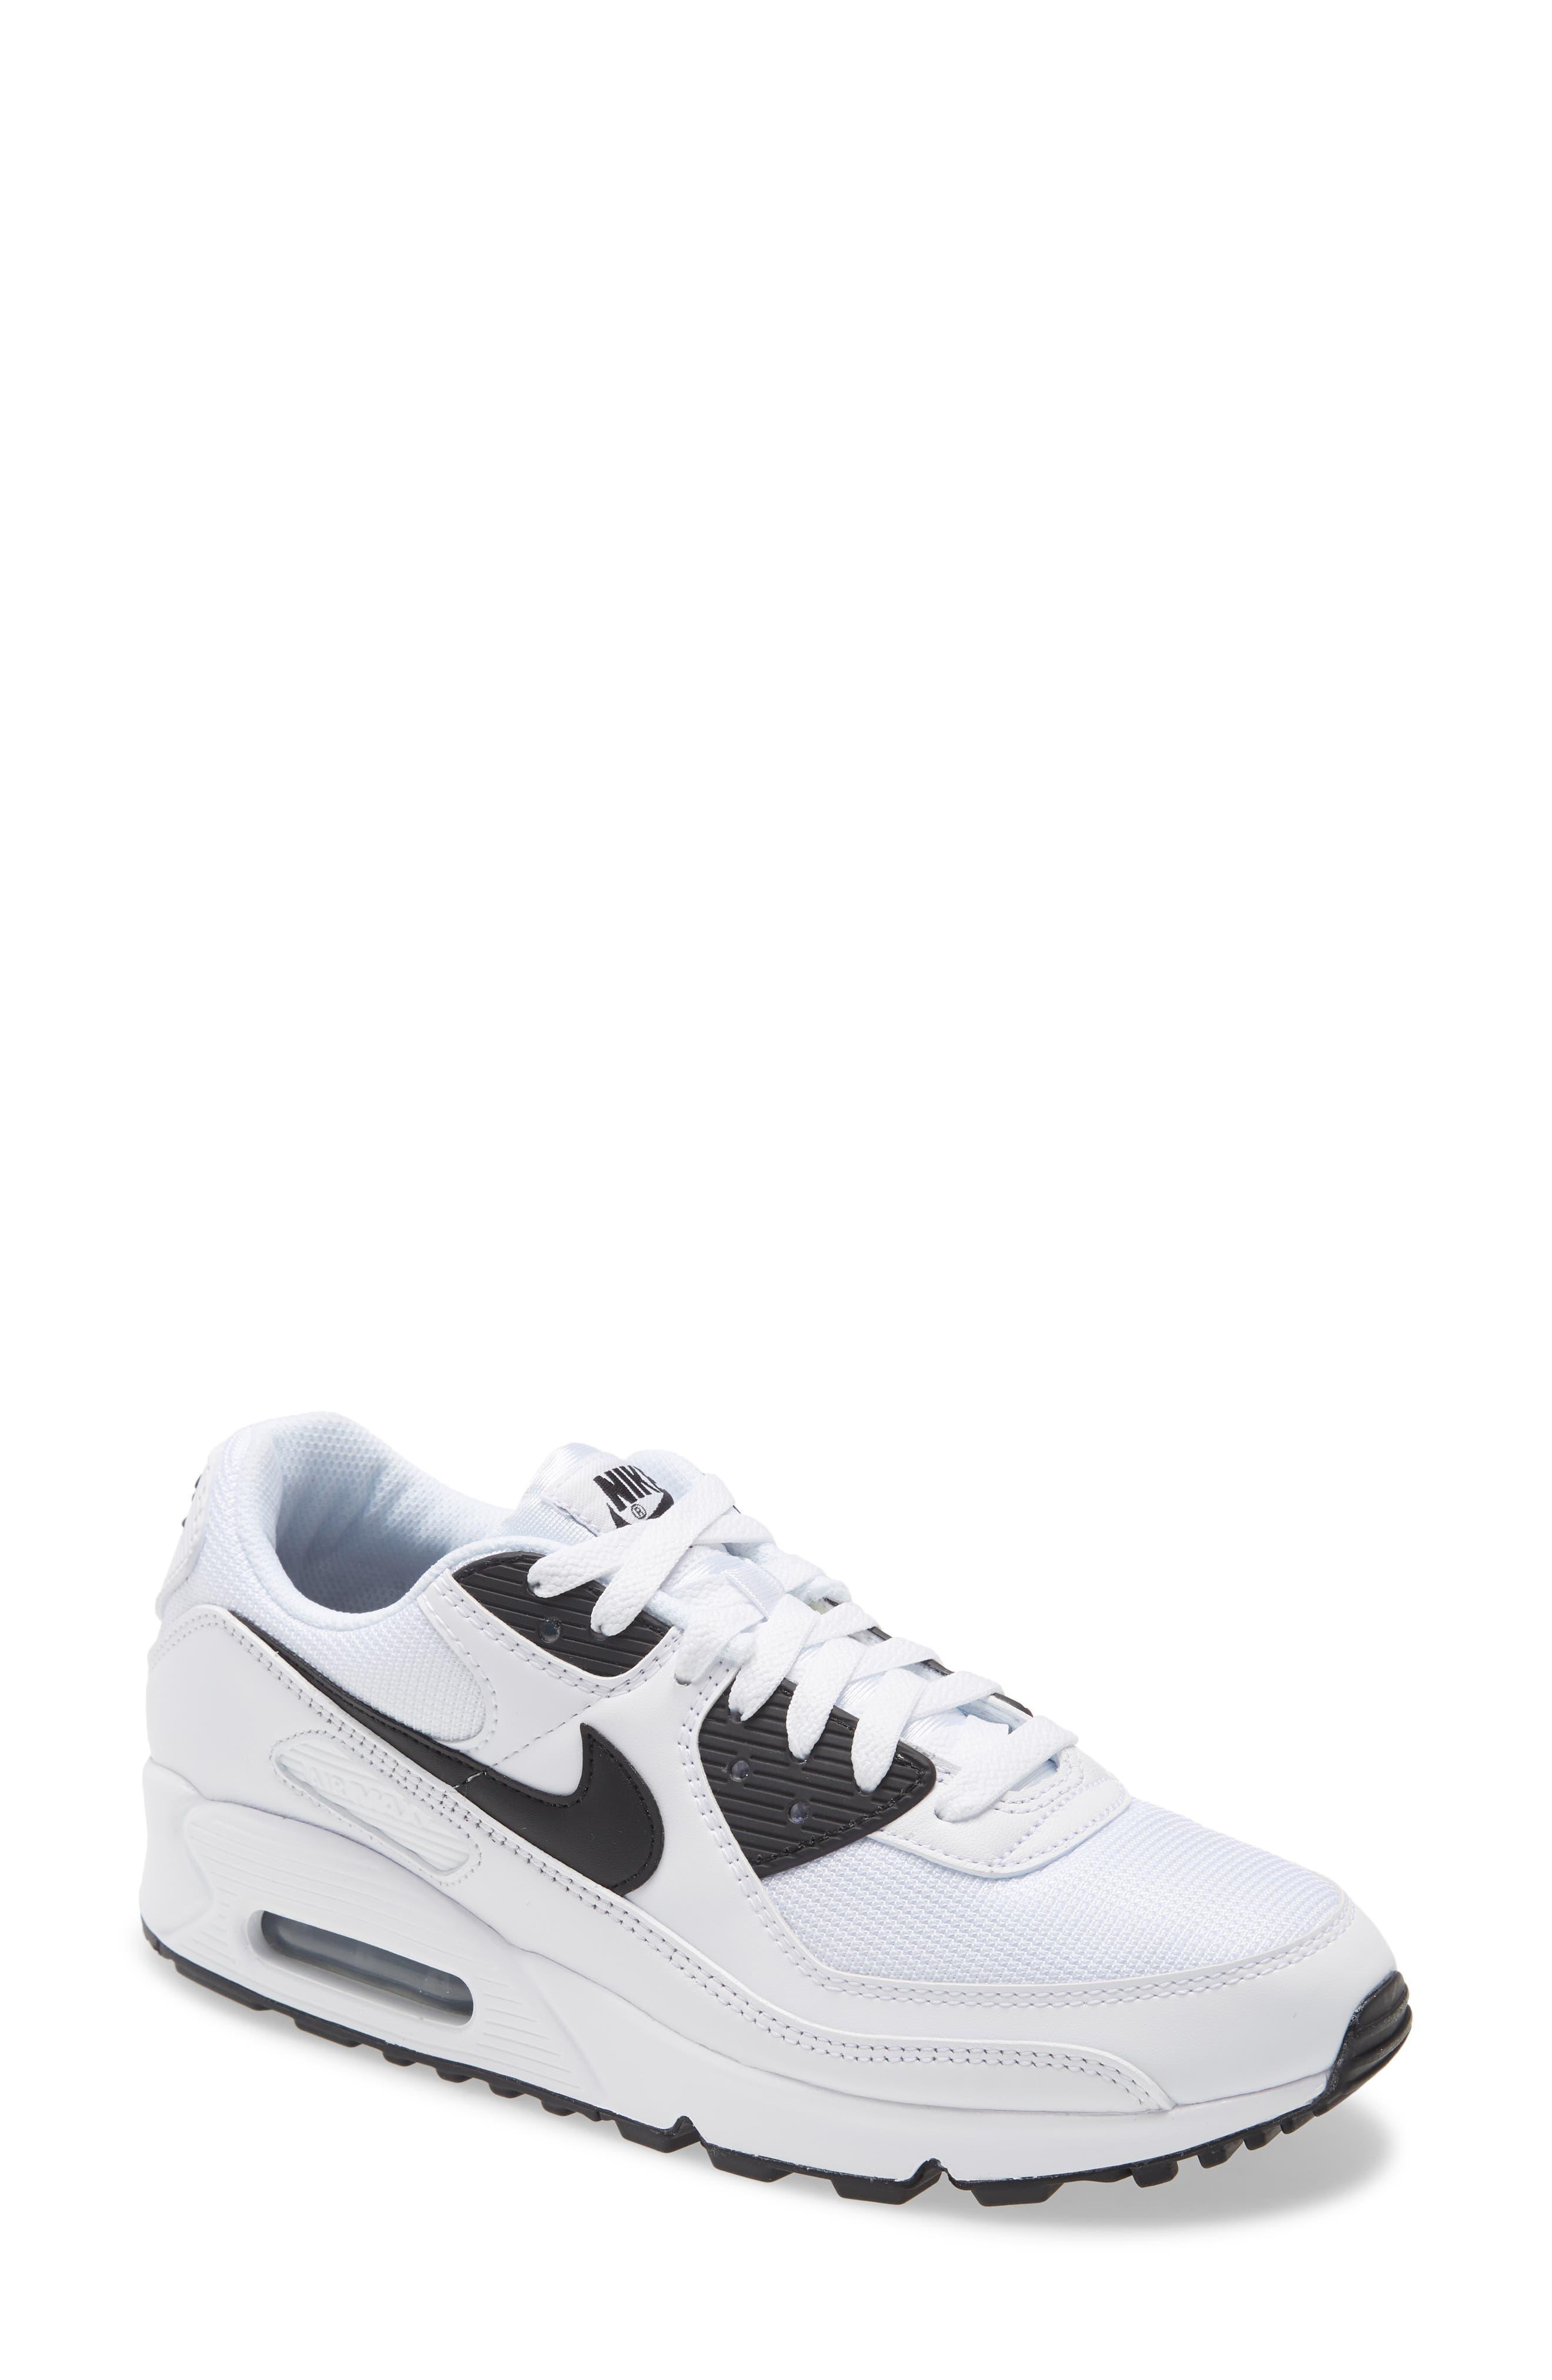 Men's Nike Air Max 90 Sneaker, Size 9 M - White | SportSpyder